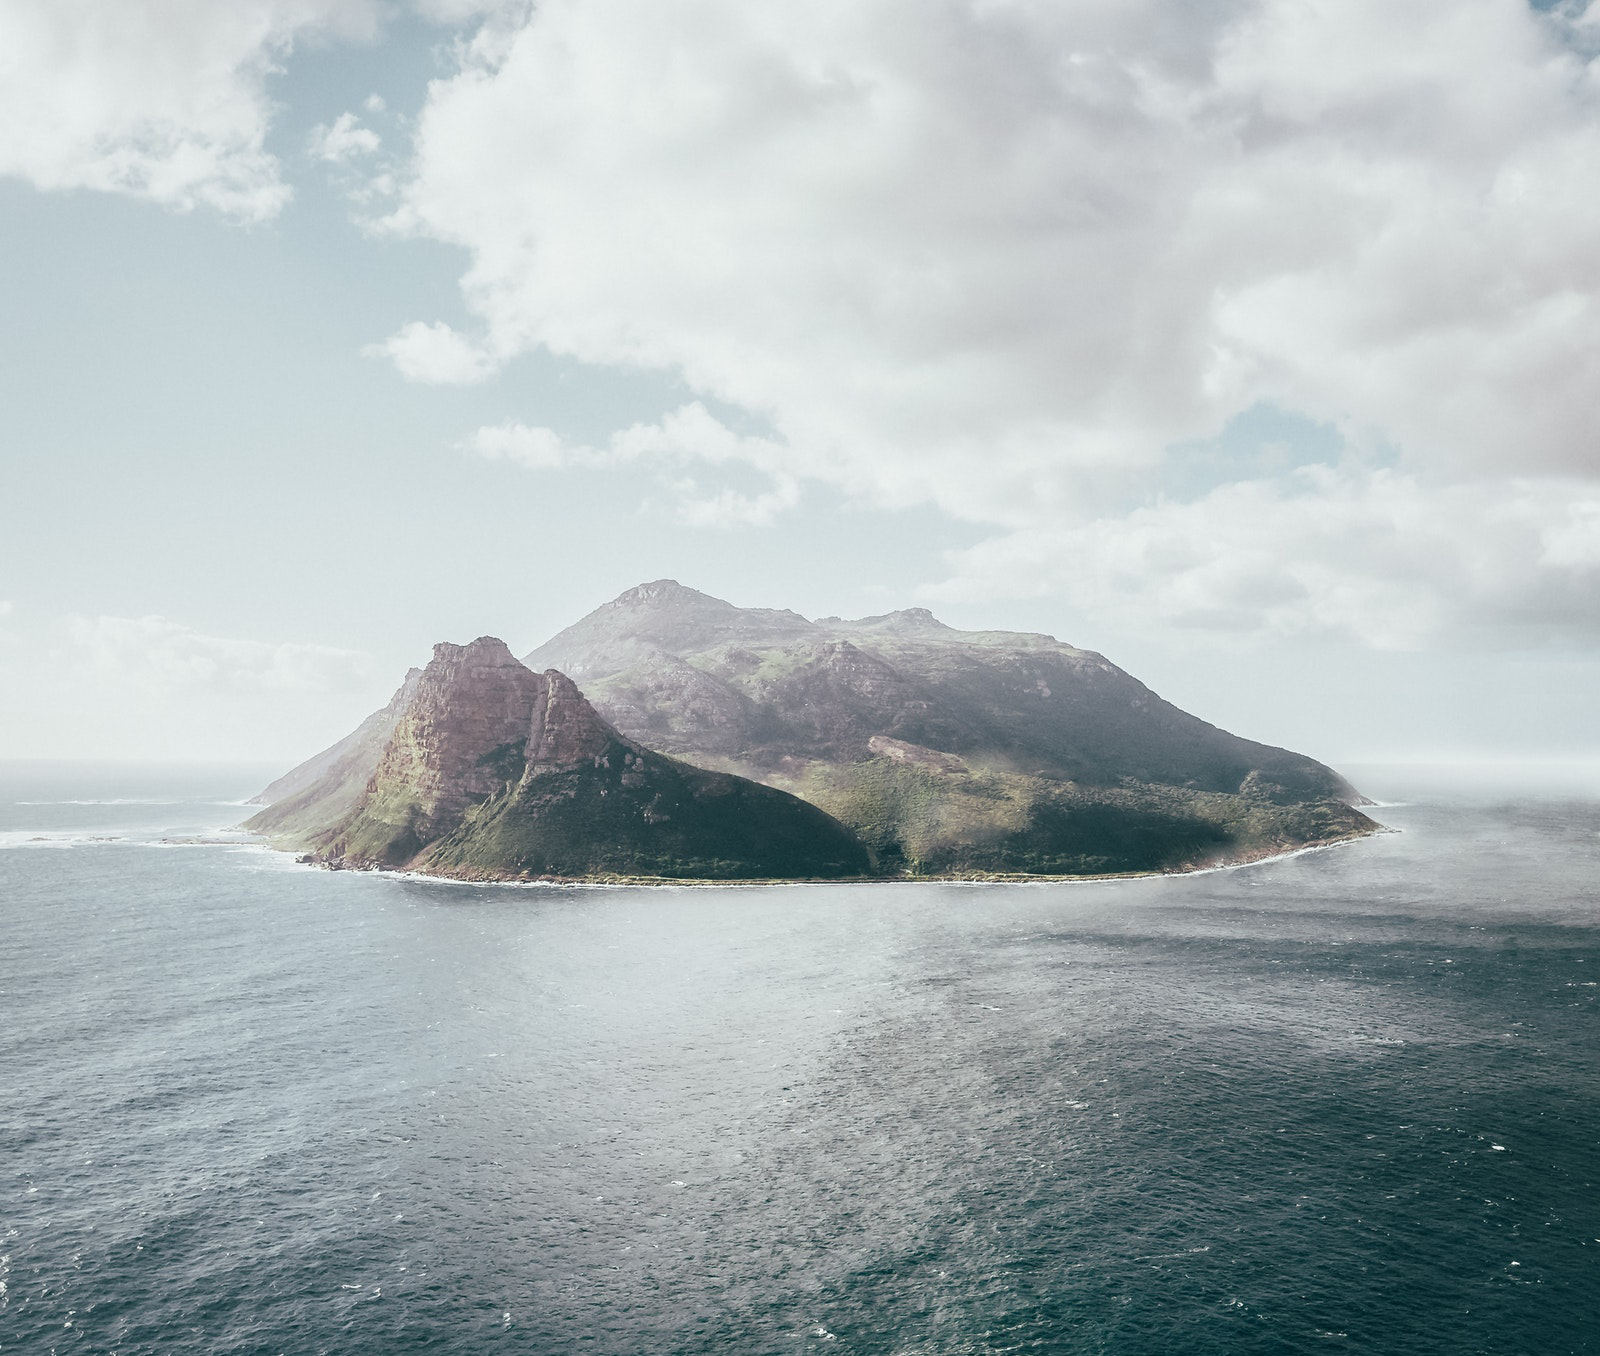 Insel ereneo sun island